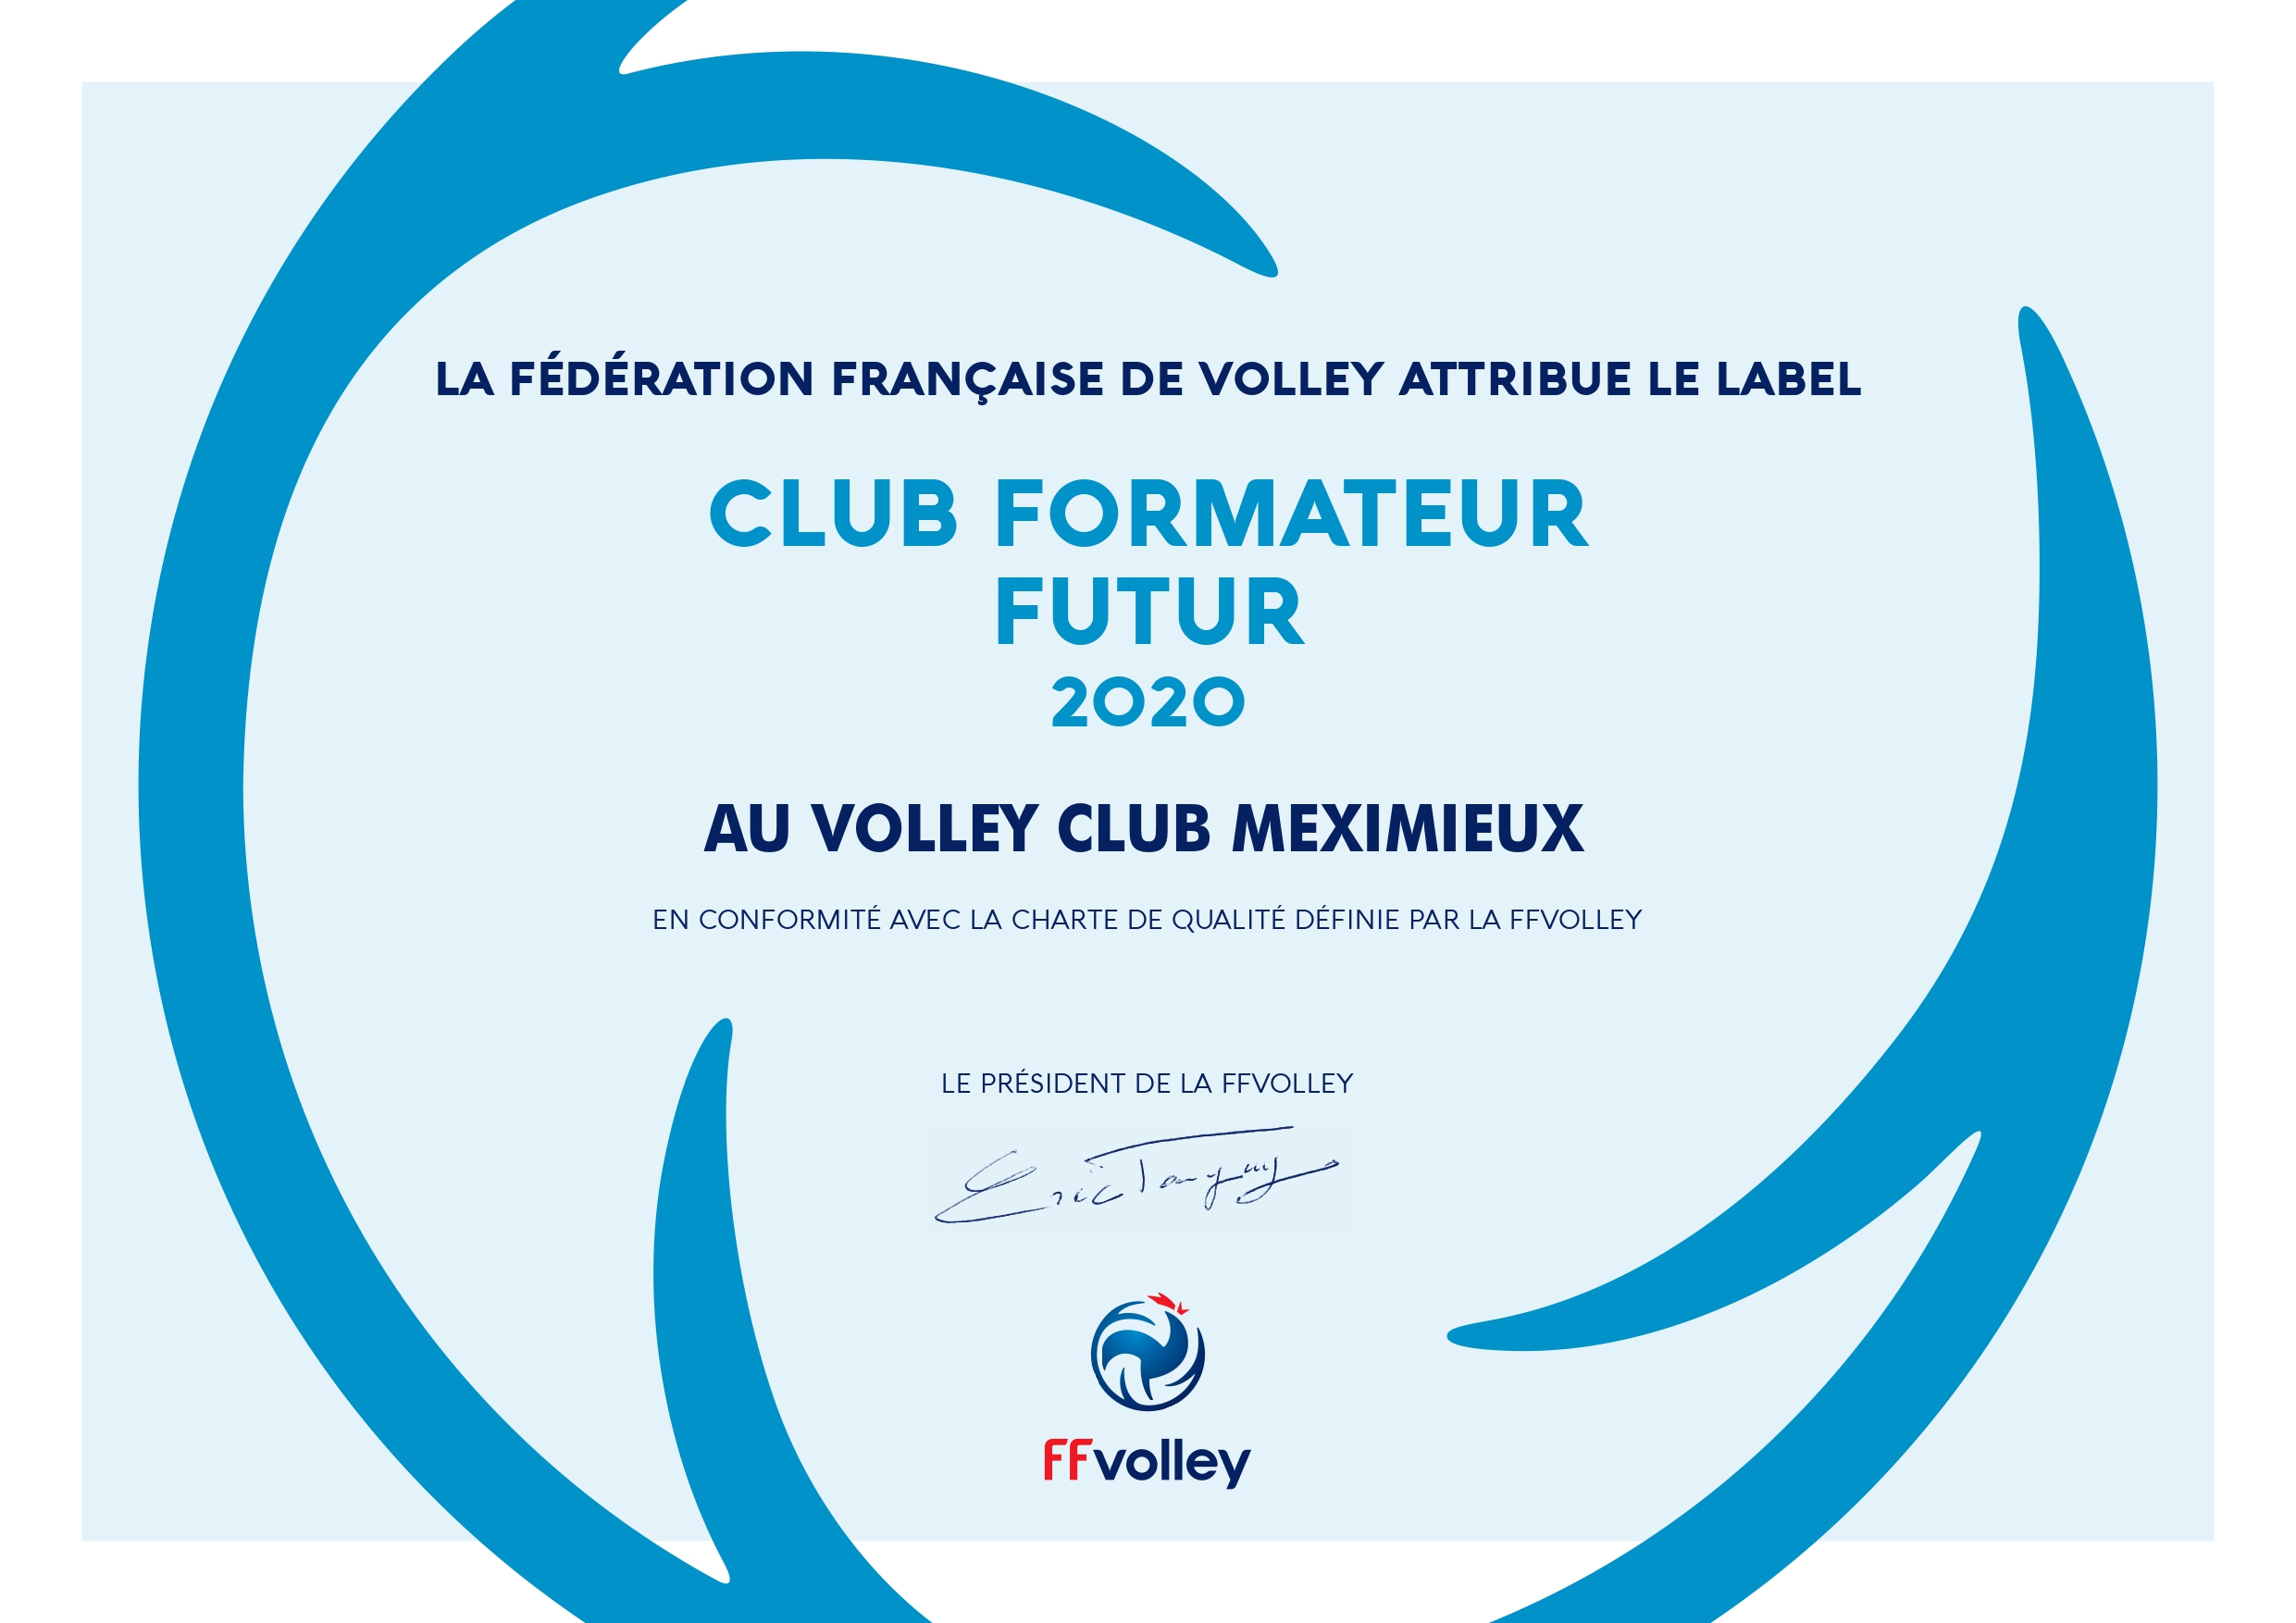 Club Formateur Futur 2019.jpg